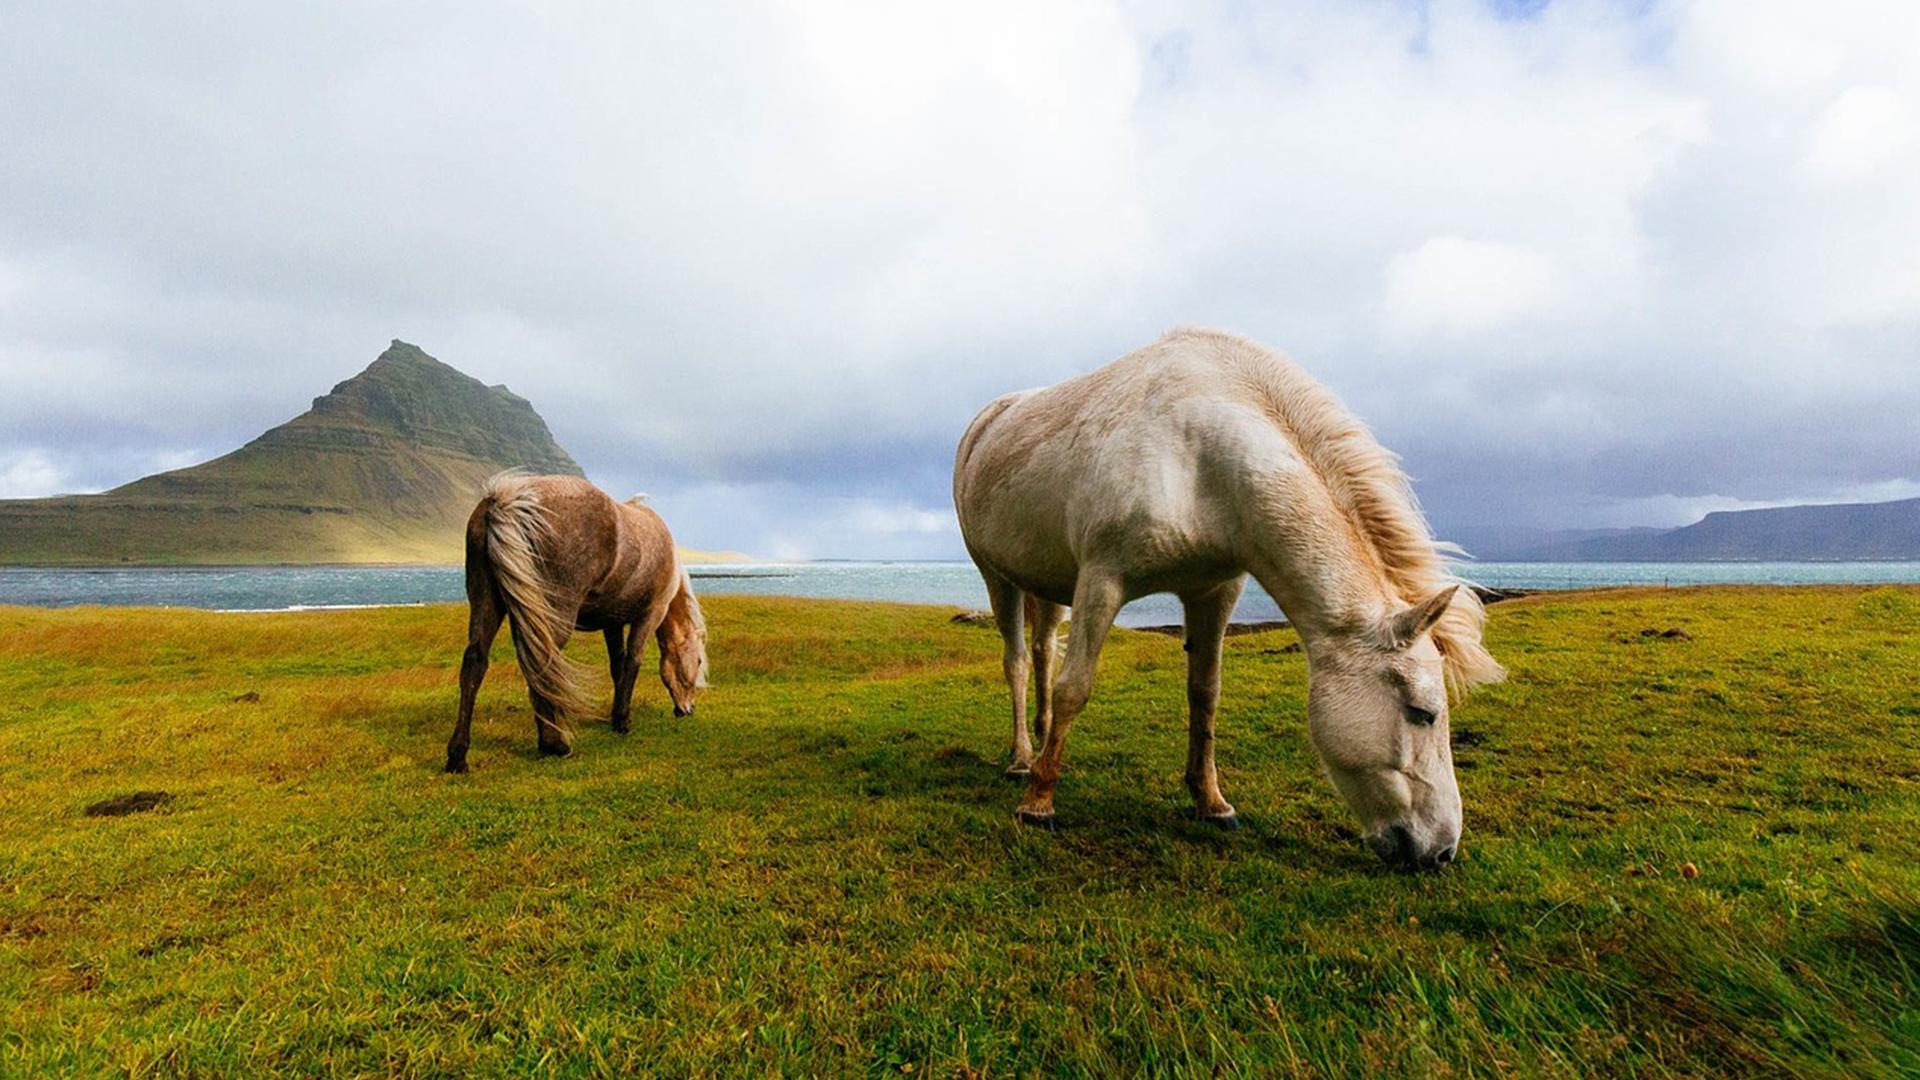 horses-1149185_1280_Edited.jpg